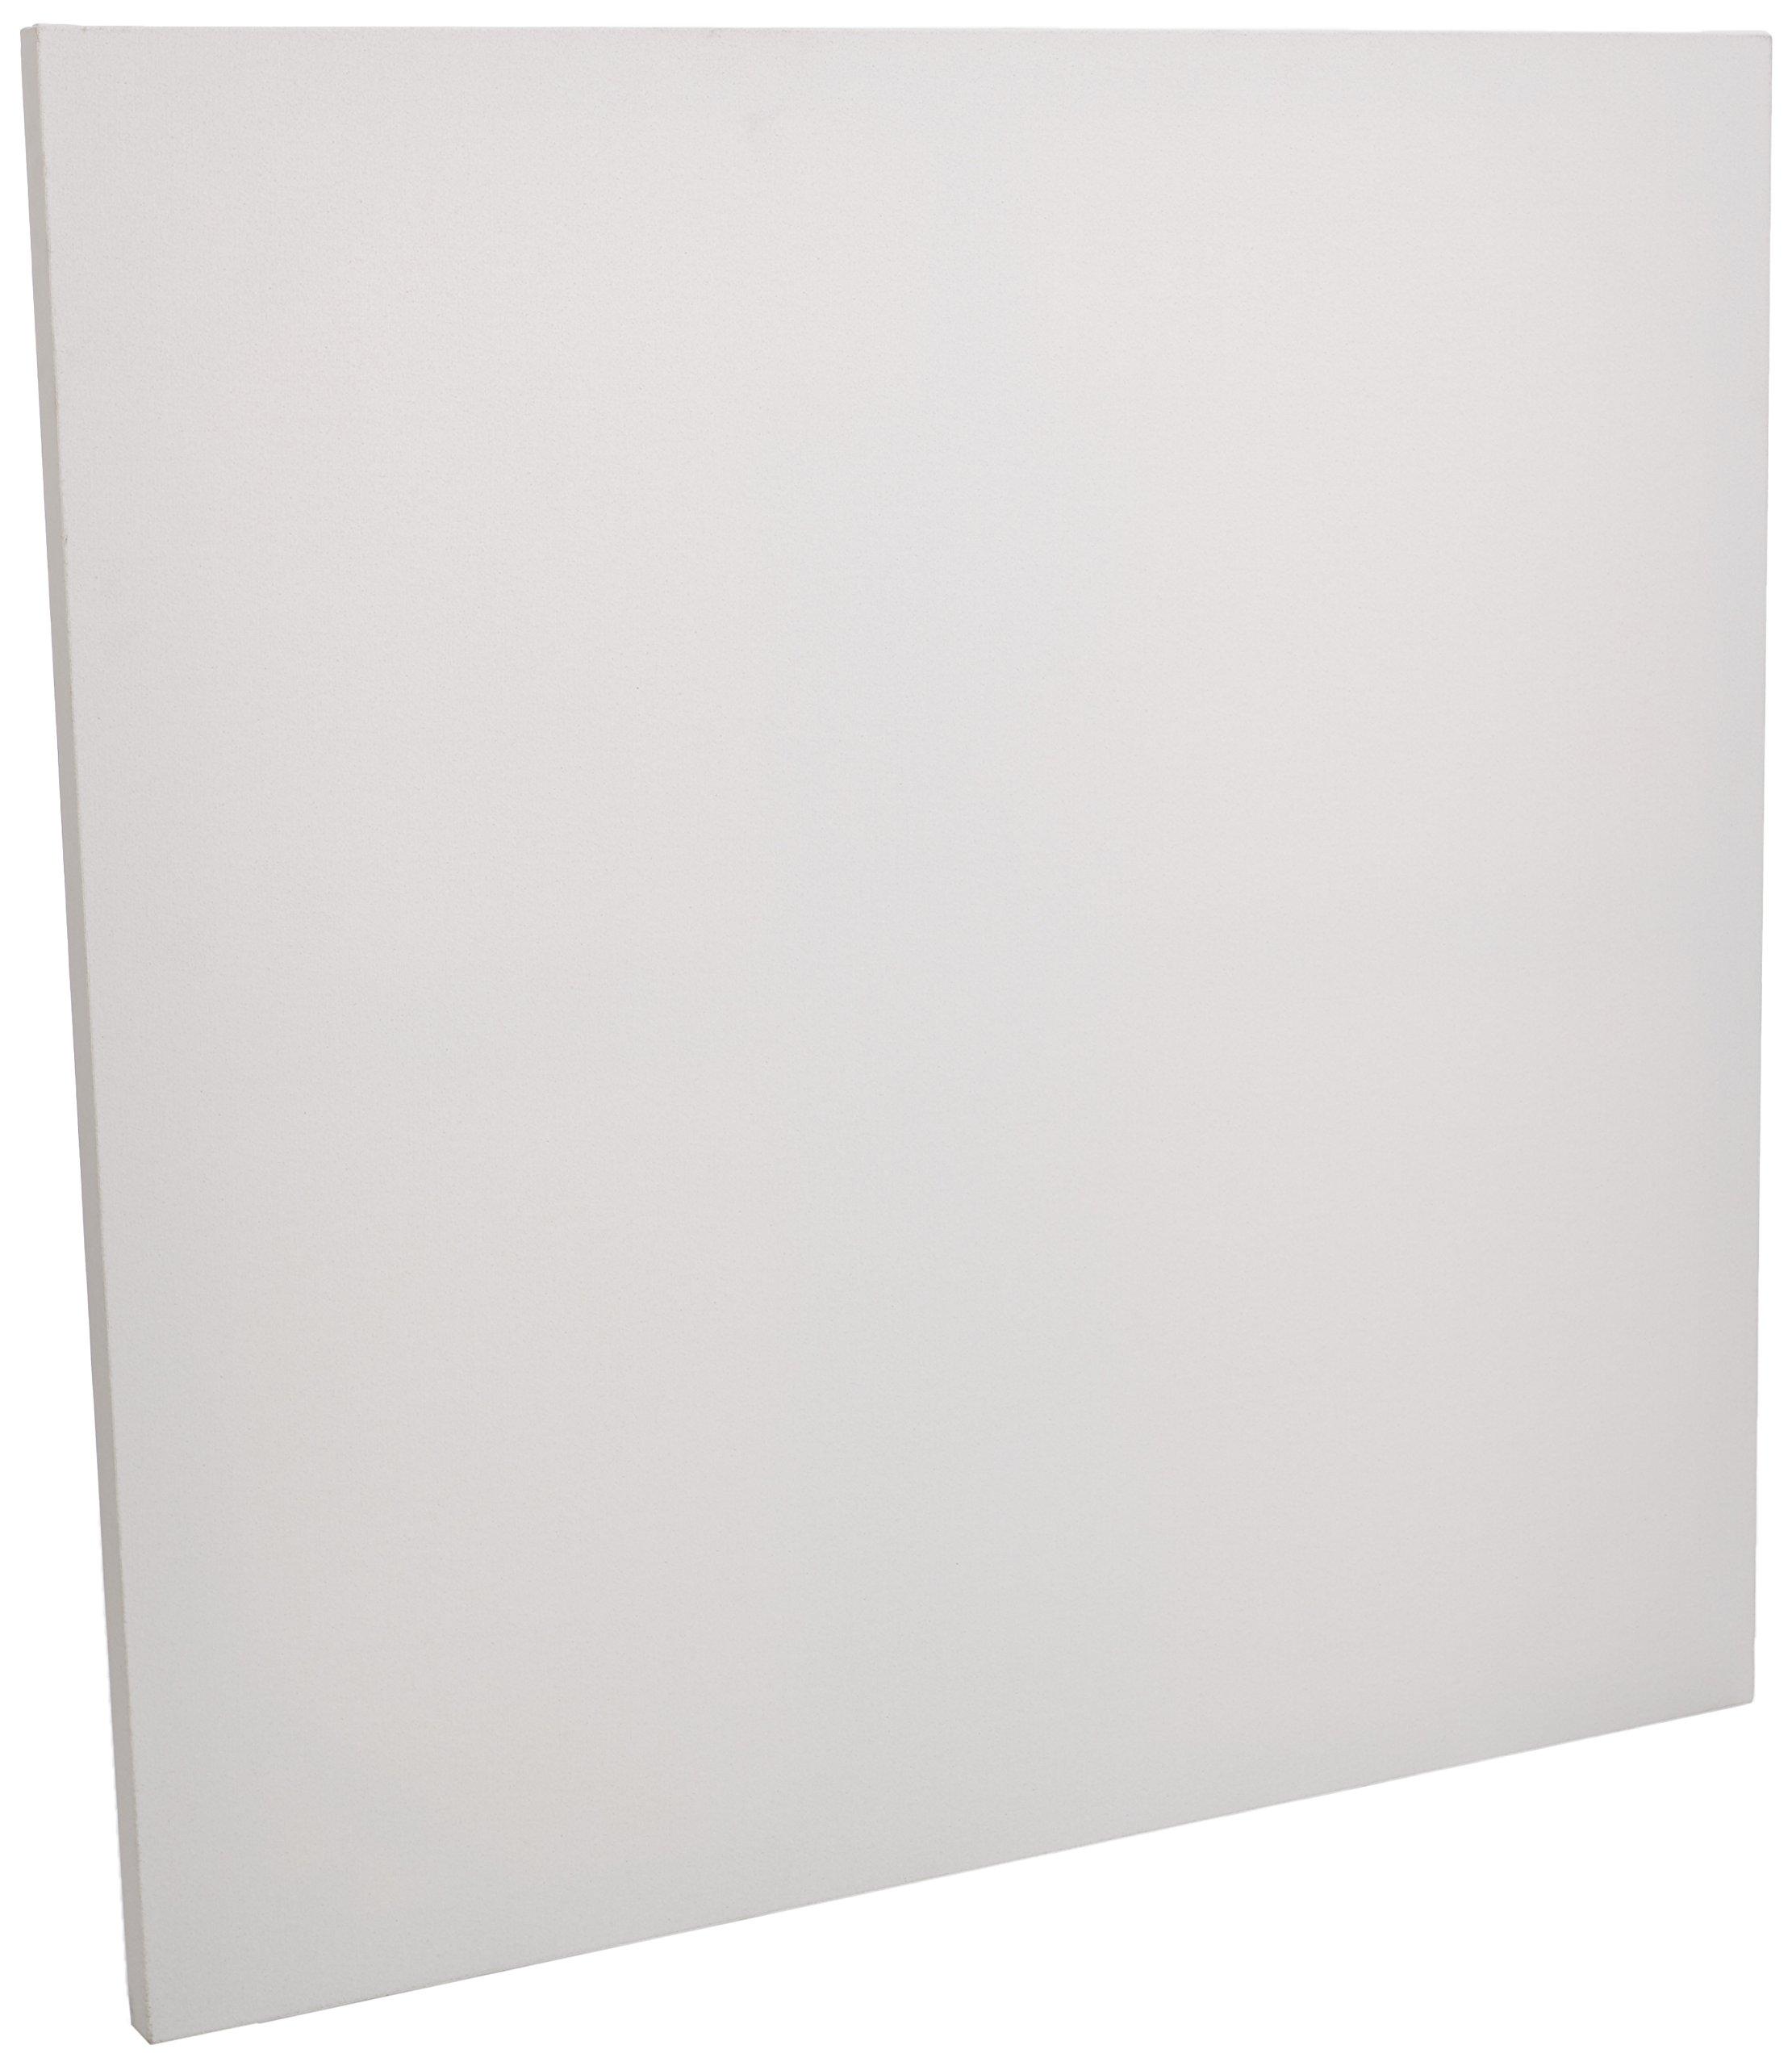 Masterpiece Artist Canvas Elite 1-1/2'' Deep Cotton 20.0 oz 4X Deluxe Acrylic Primed, 48'' x 48''